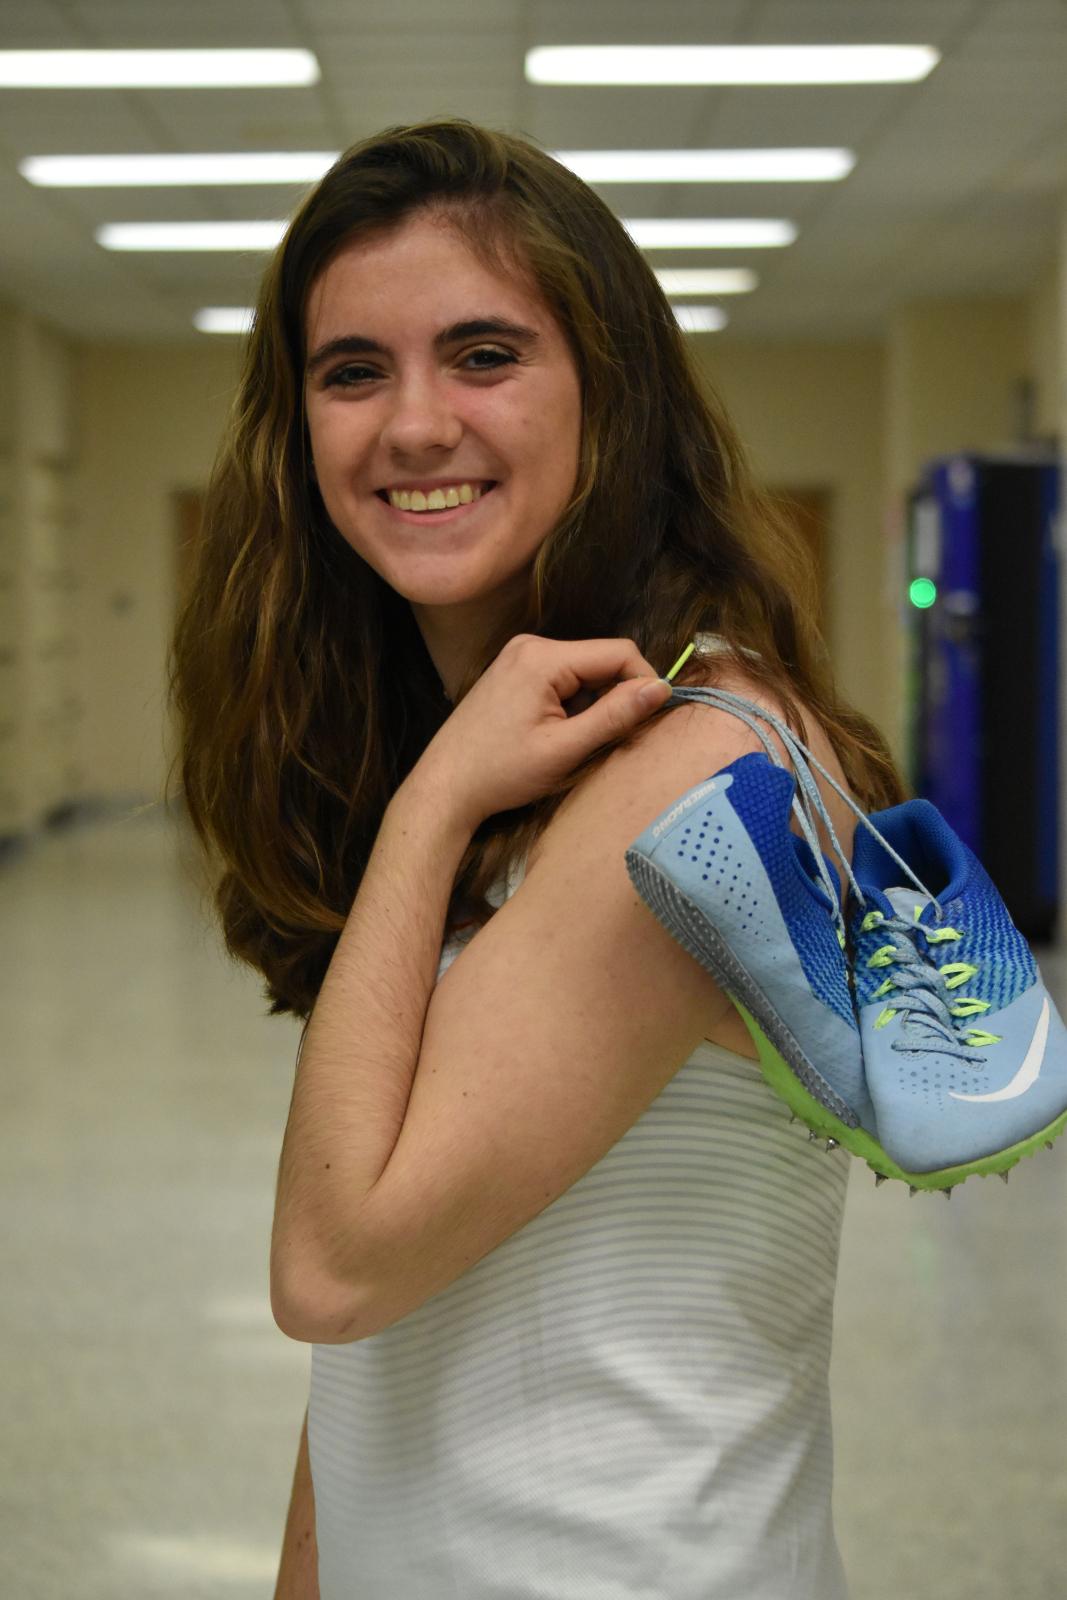 Senior Spotlight: Melanie Edmond